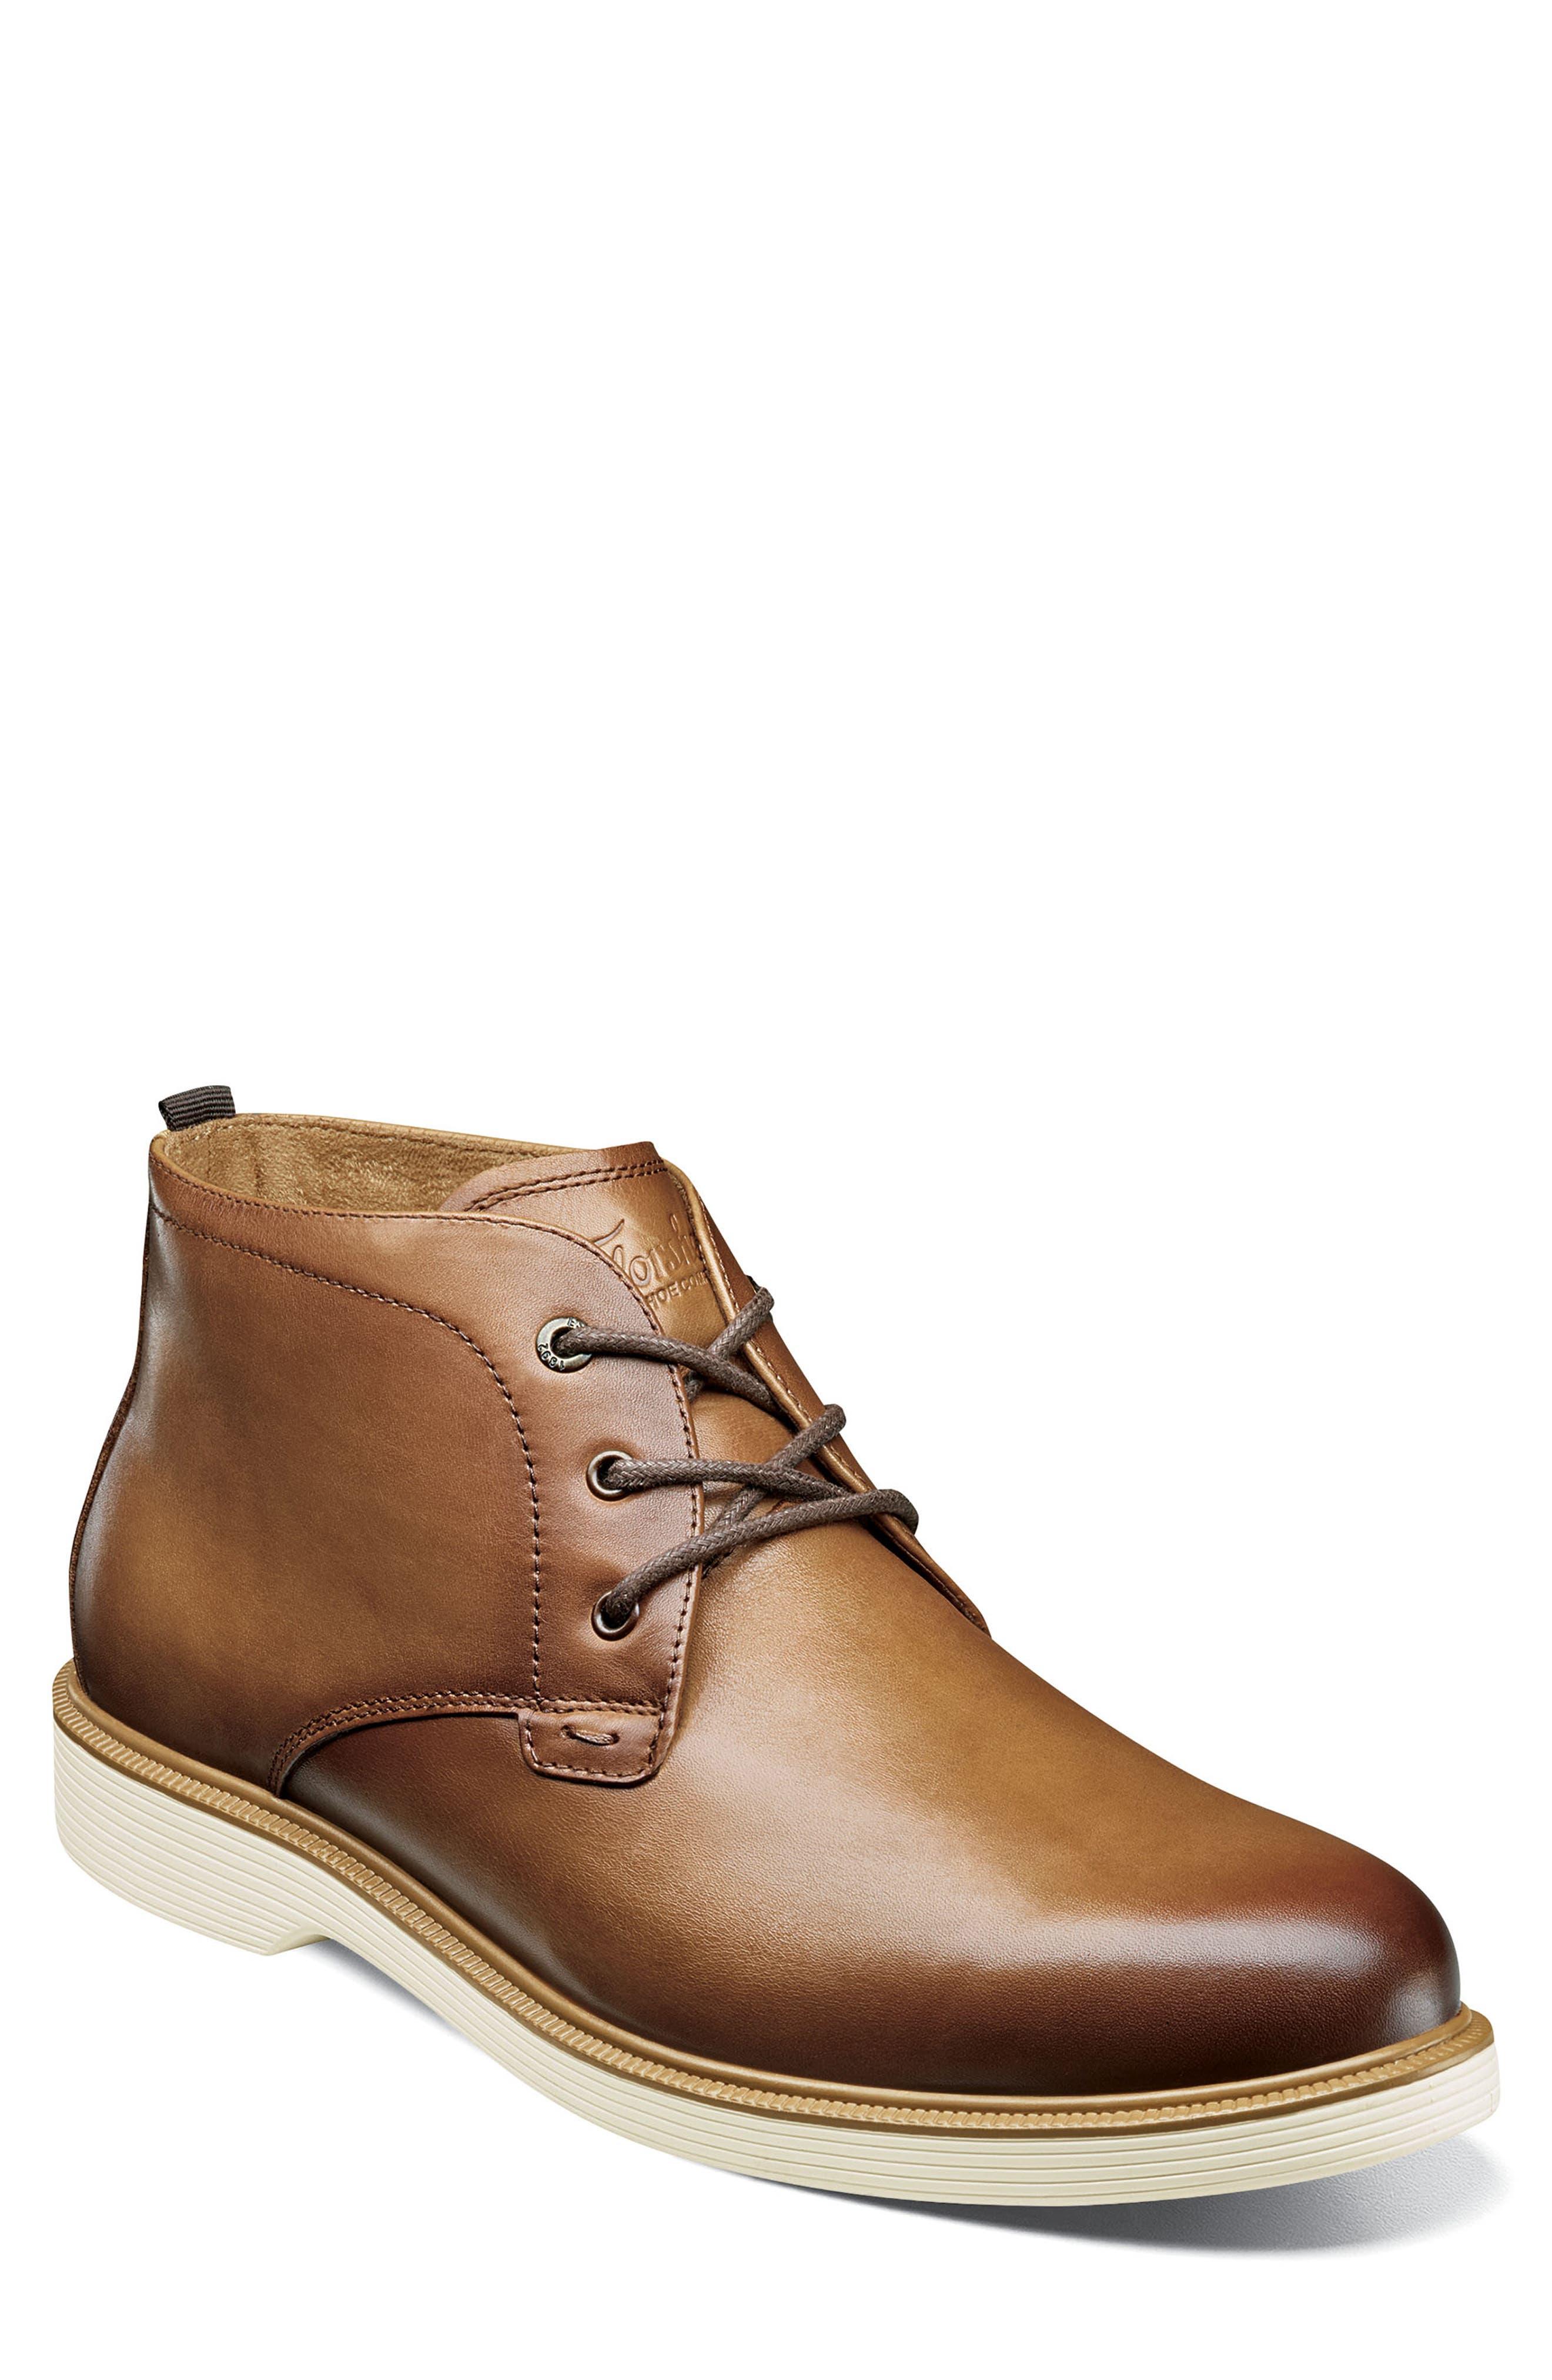 Florsheim Supacush Chukka Boot - Brown